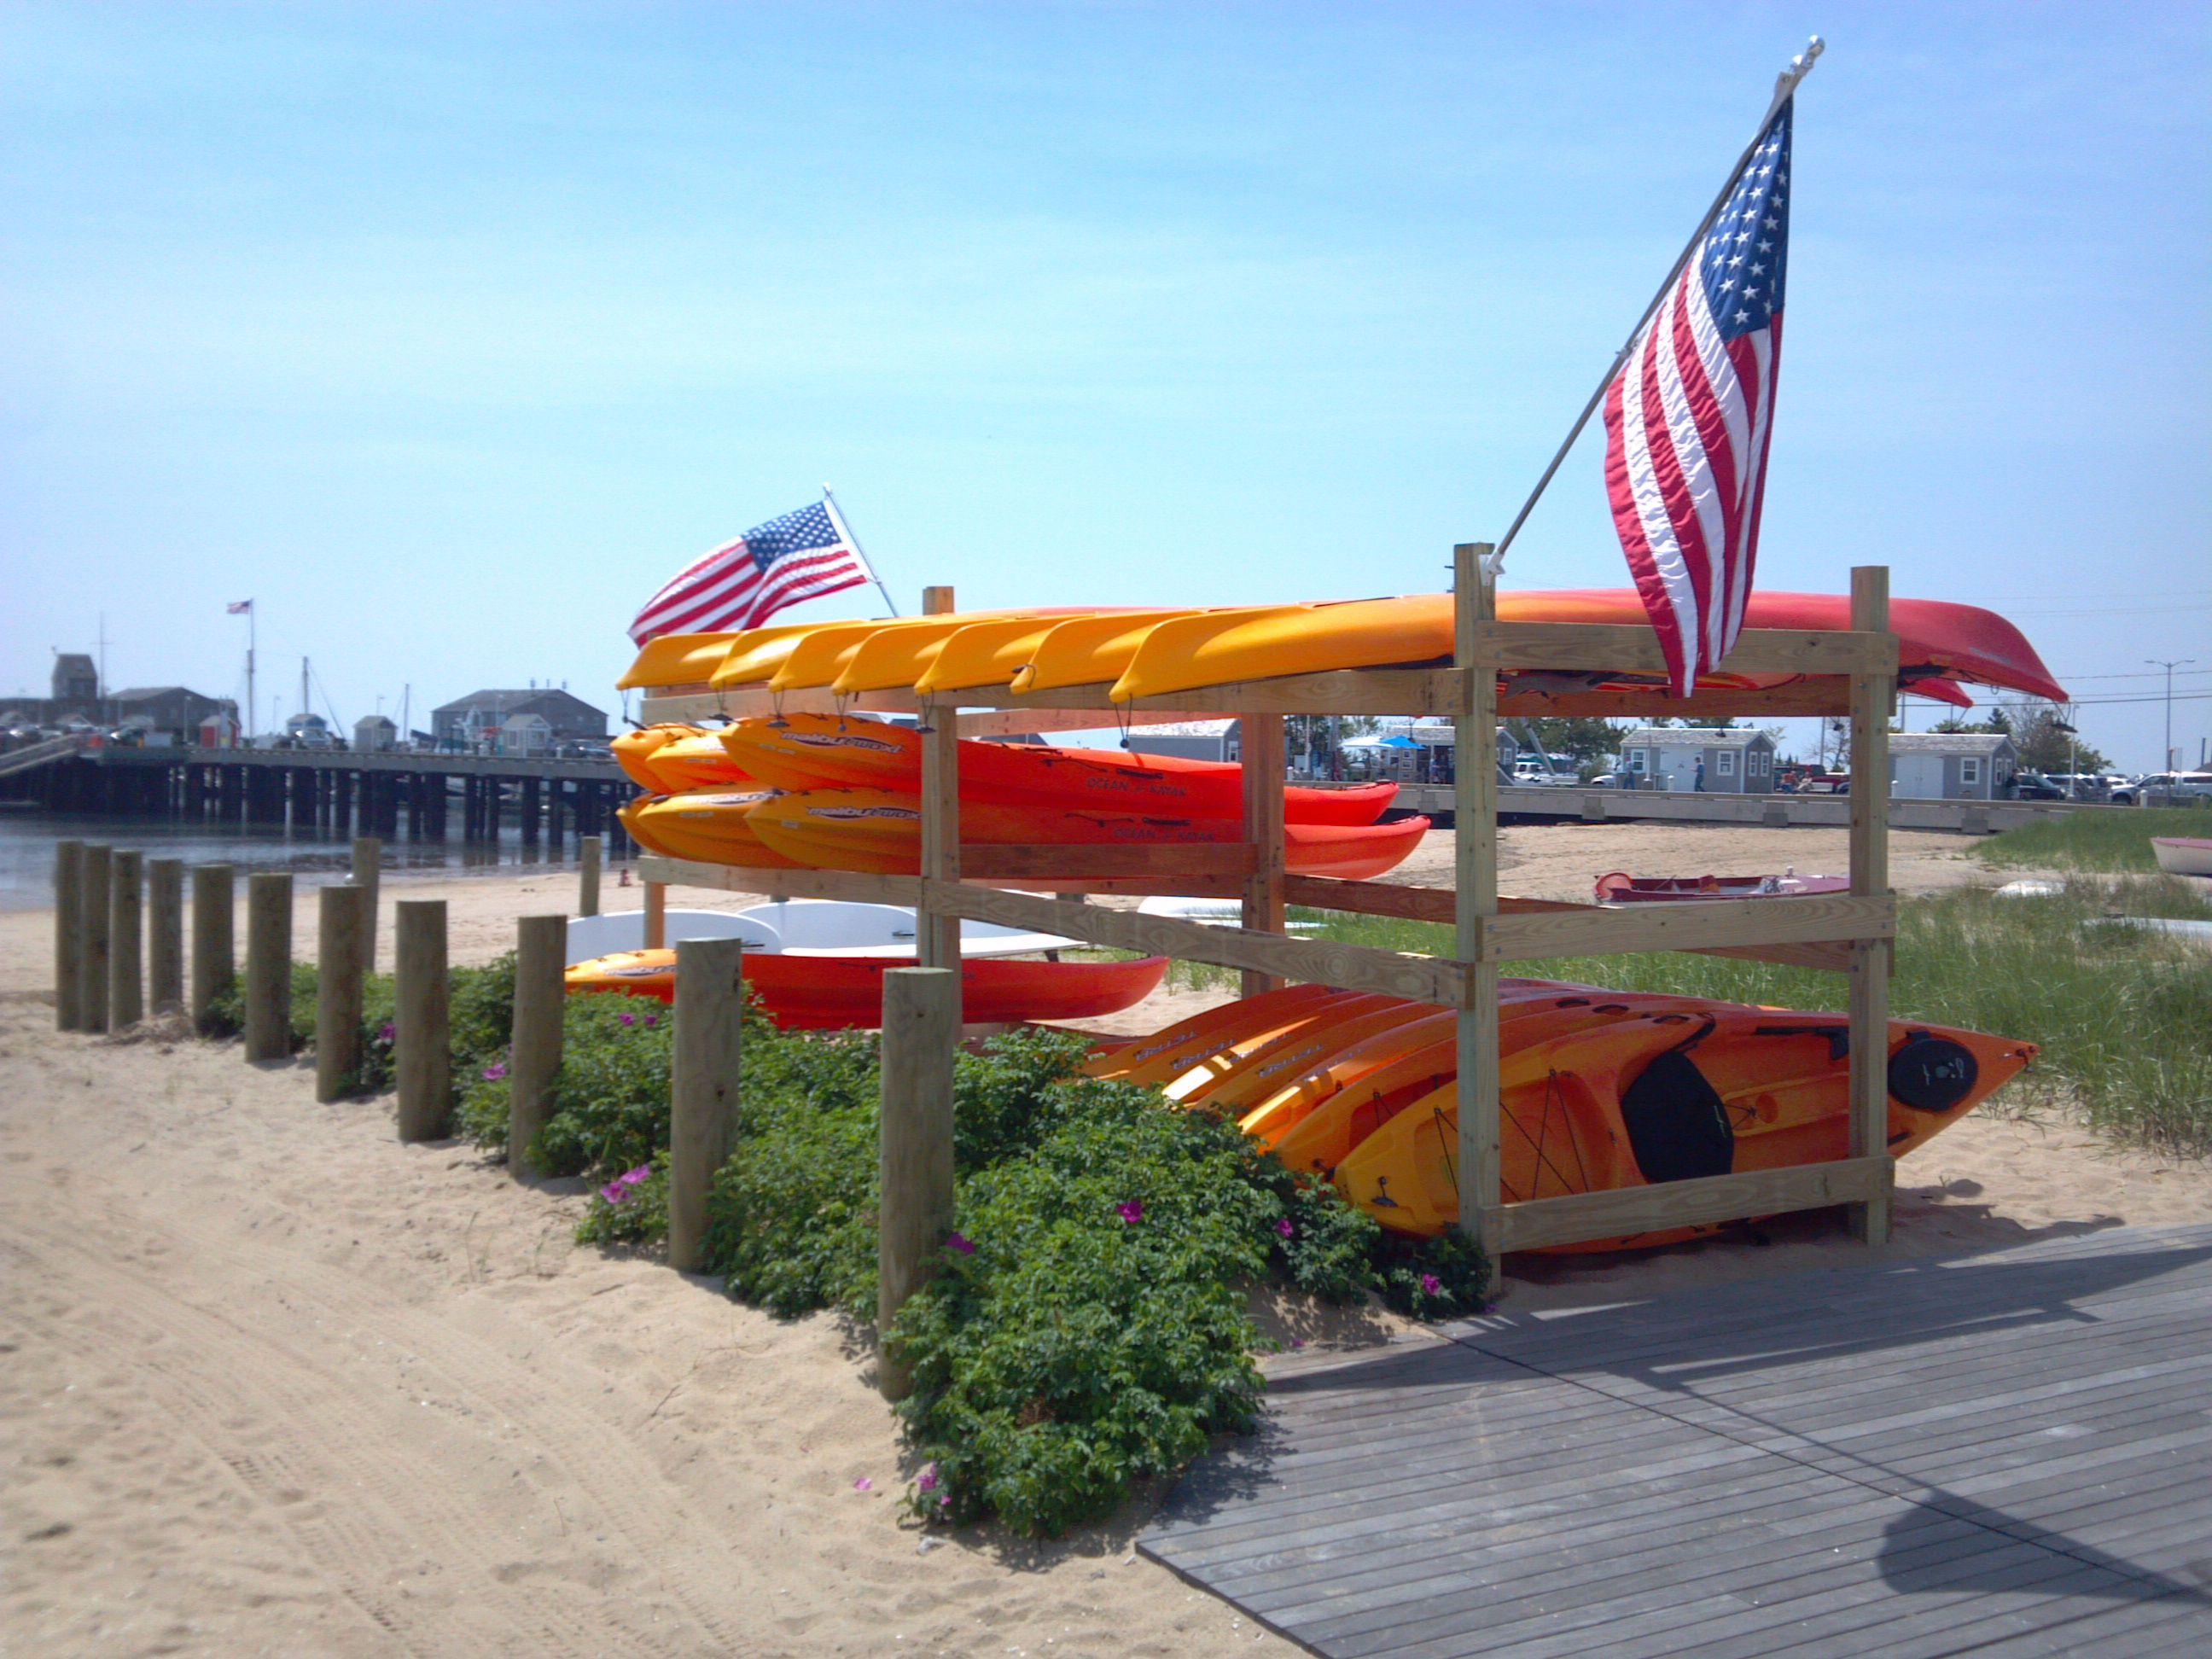 Kayak rentals in ptown kayaking paddle board rentals